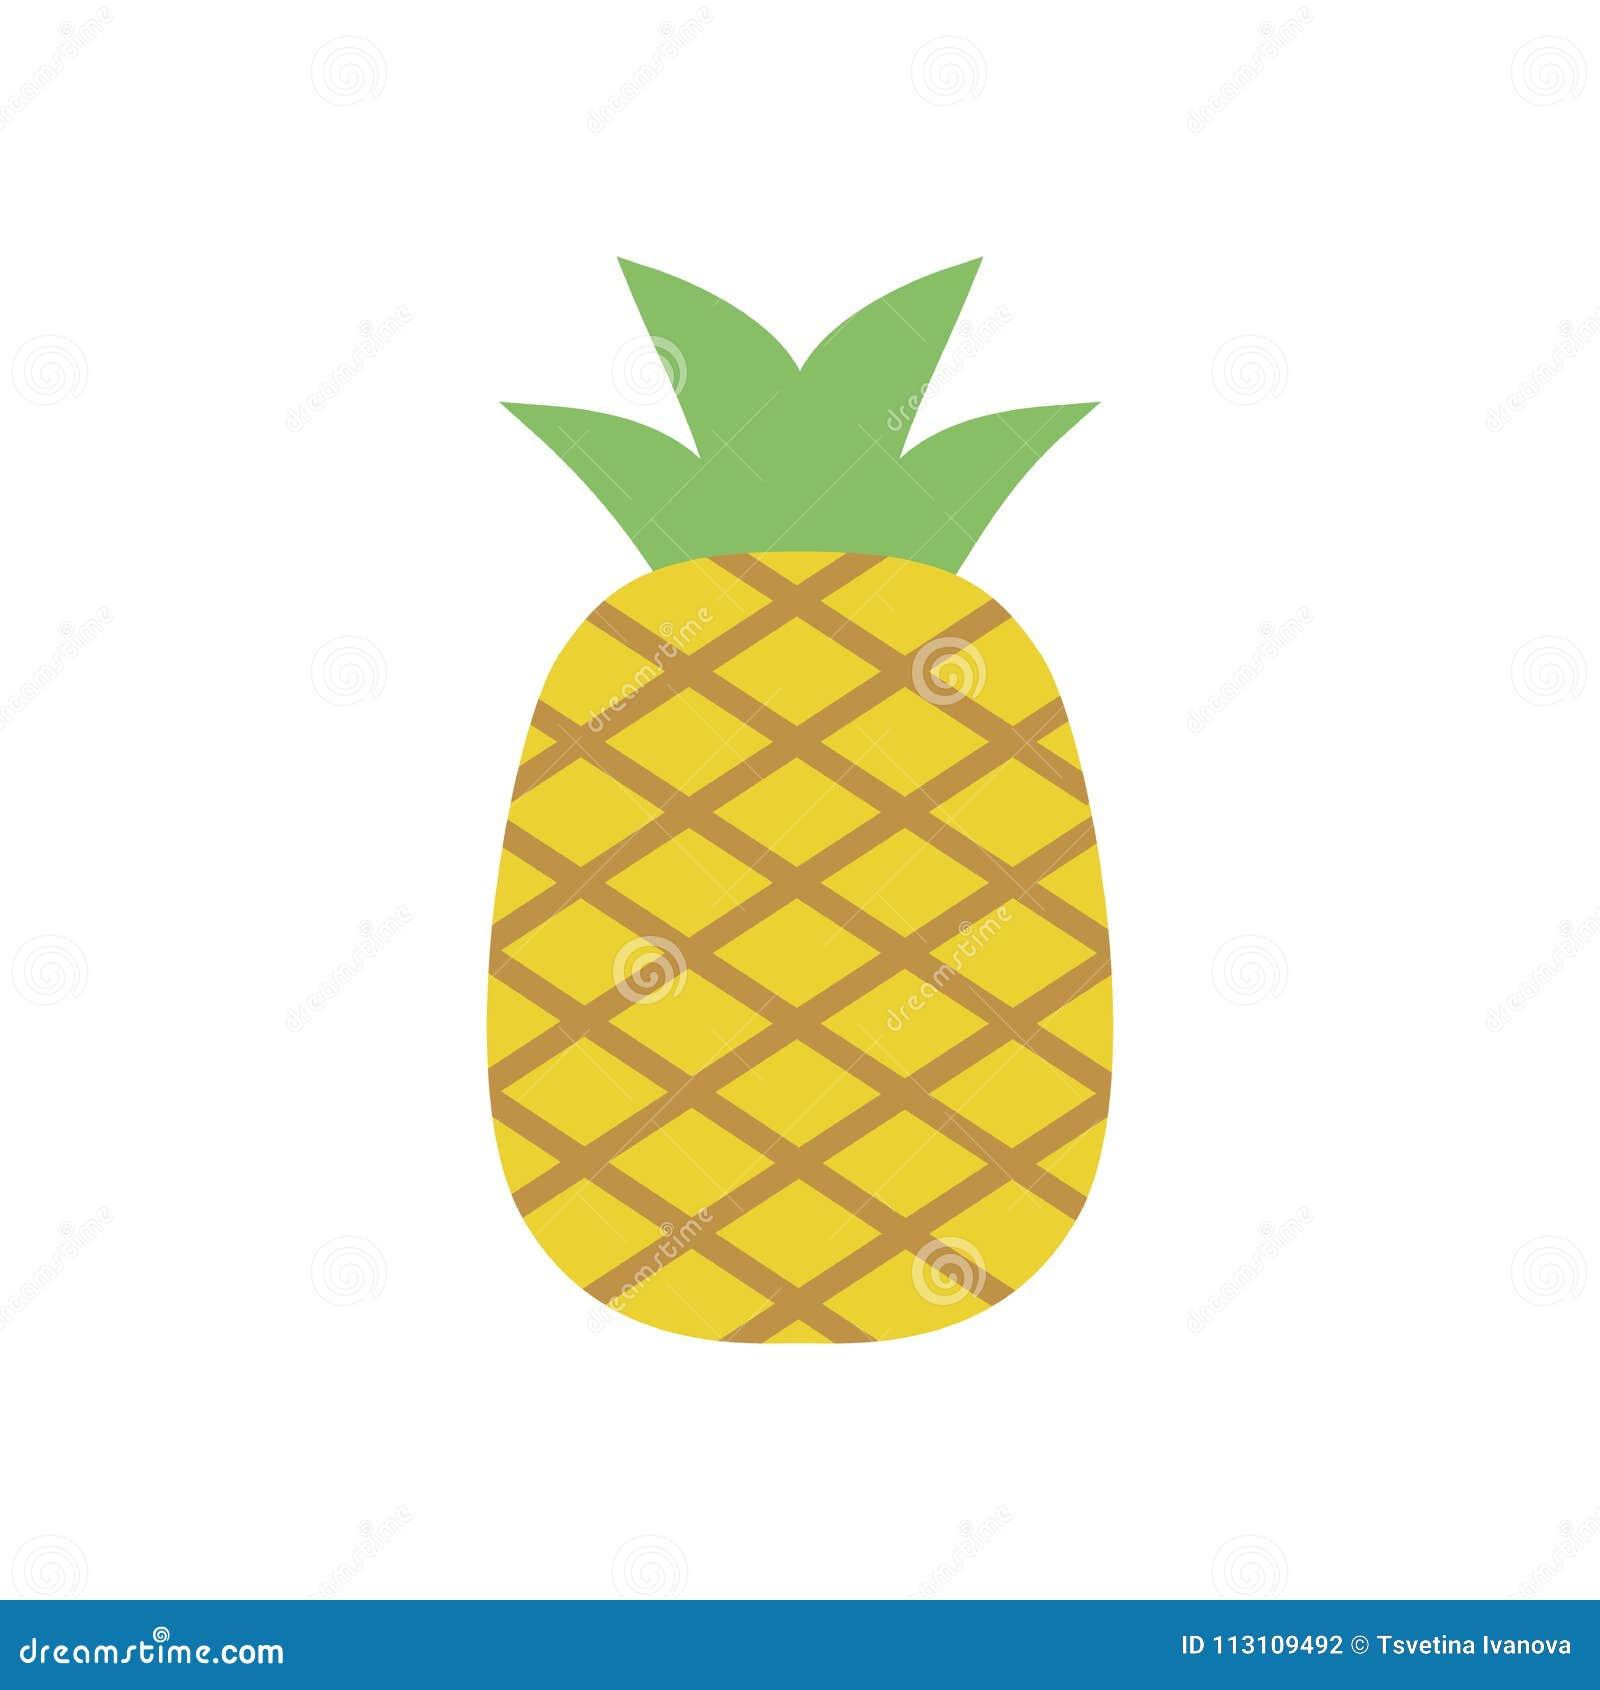 Pineapple Icon, Simple Design, Pineappleicon Clip Art ...